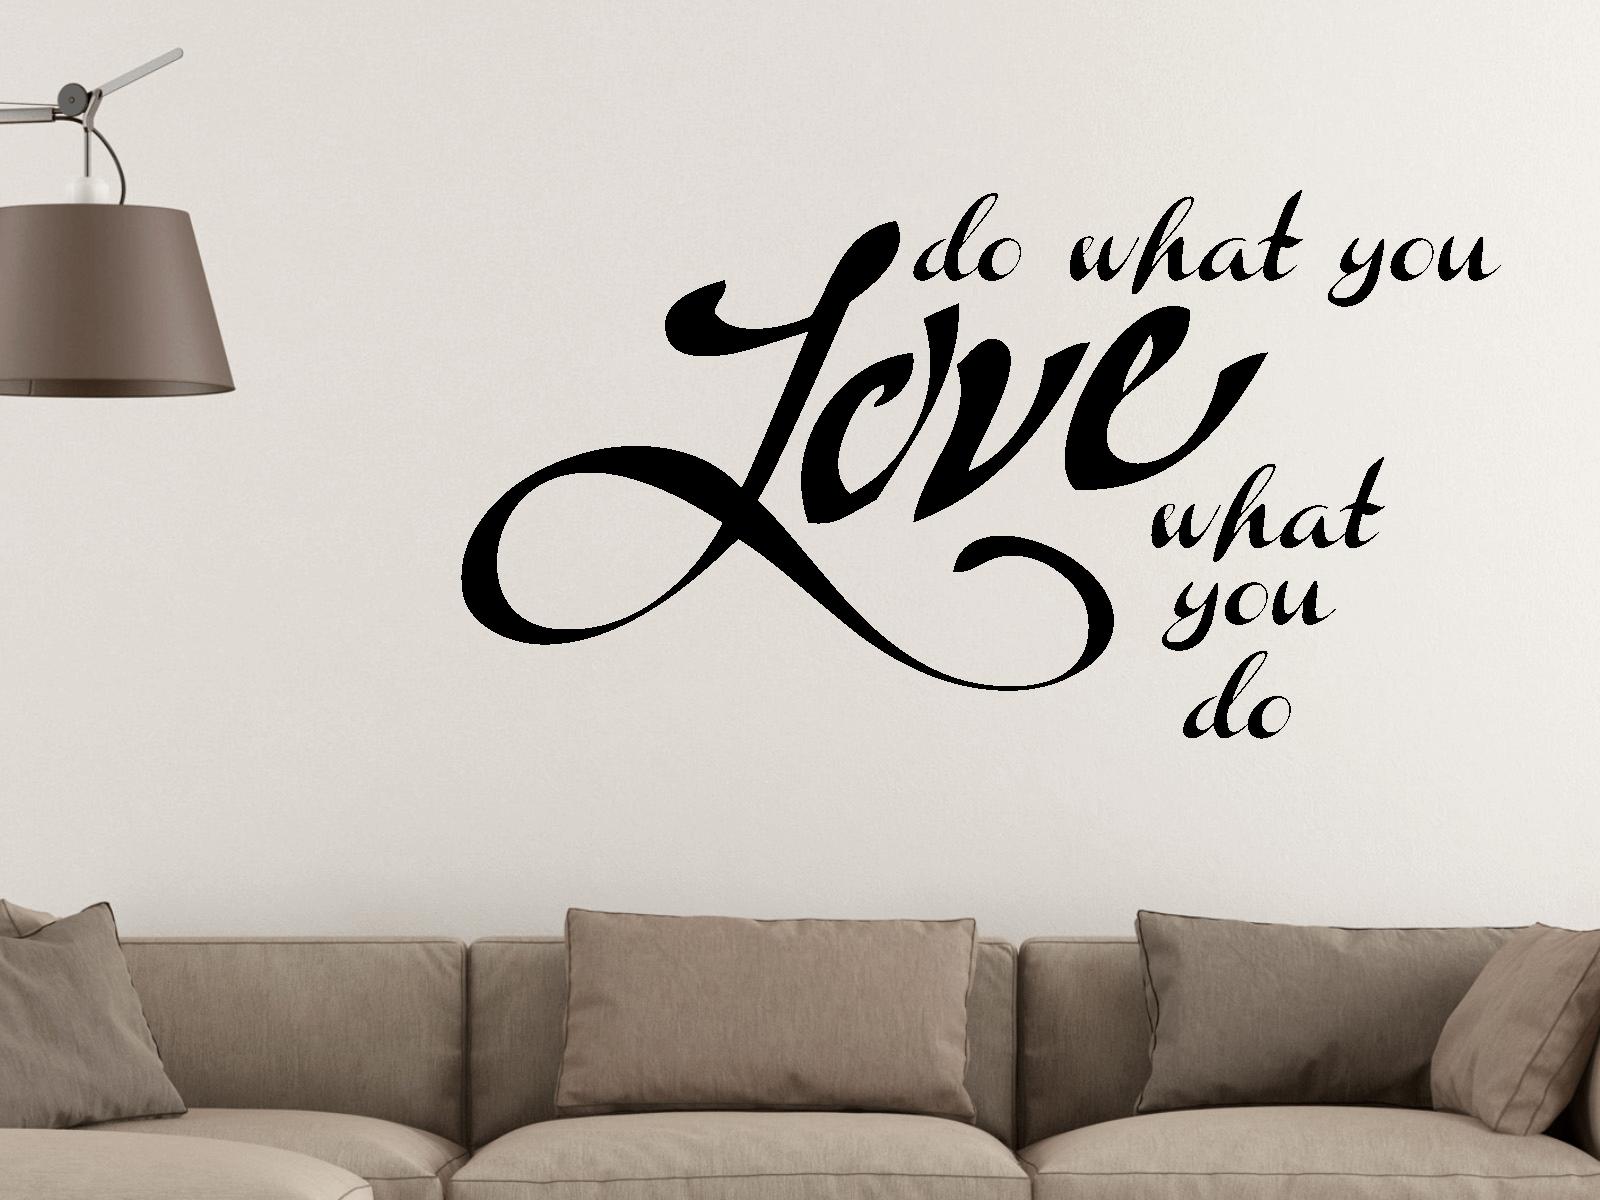 wandtattoo do what you love motiv nr 3017 spr che schlafzimmer tocut werbetechnik wandtattoo. Black Bedroom Furniture Sets. Home Design Ideas